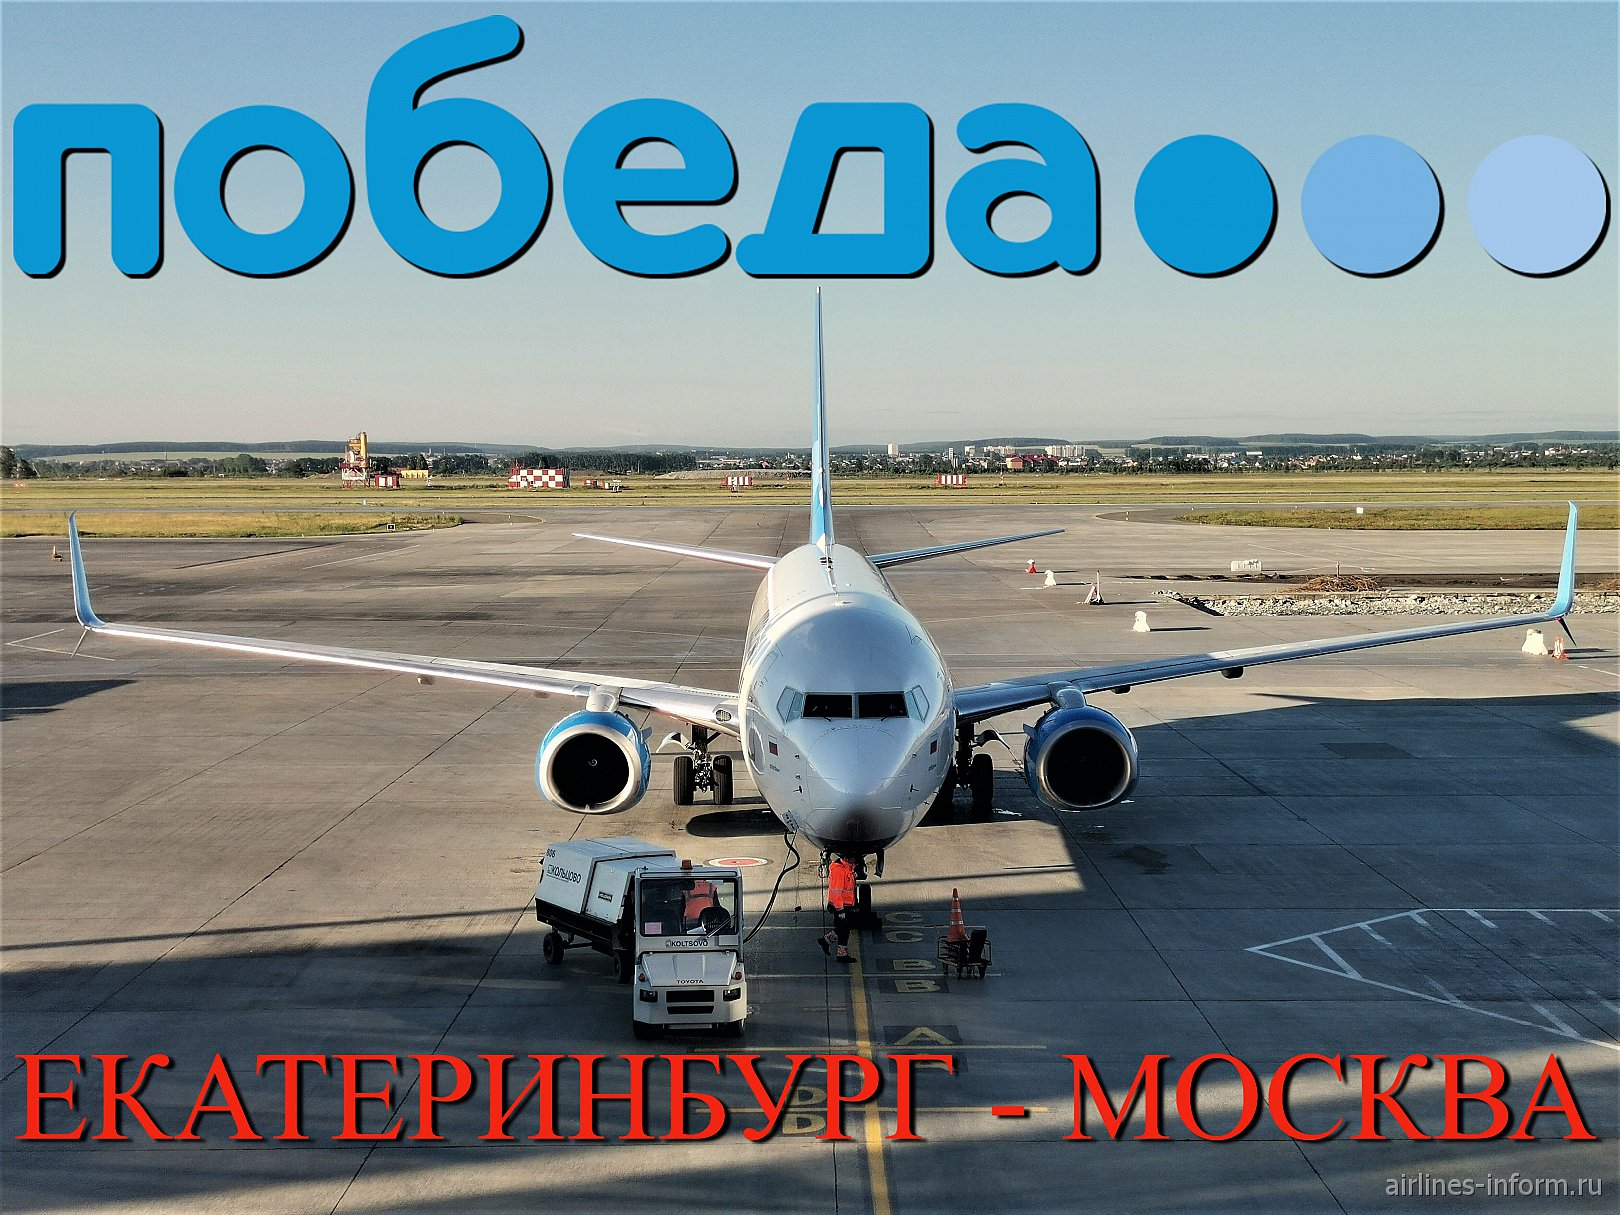 Победа: Екатеринбург - Москва